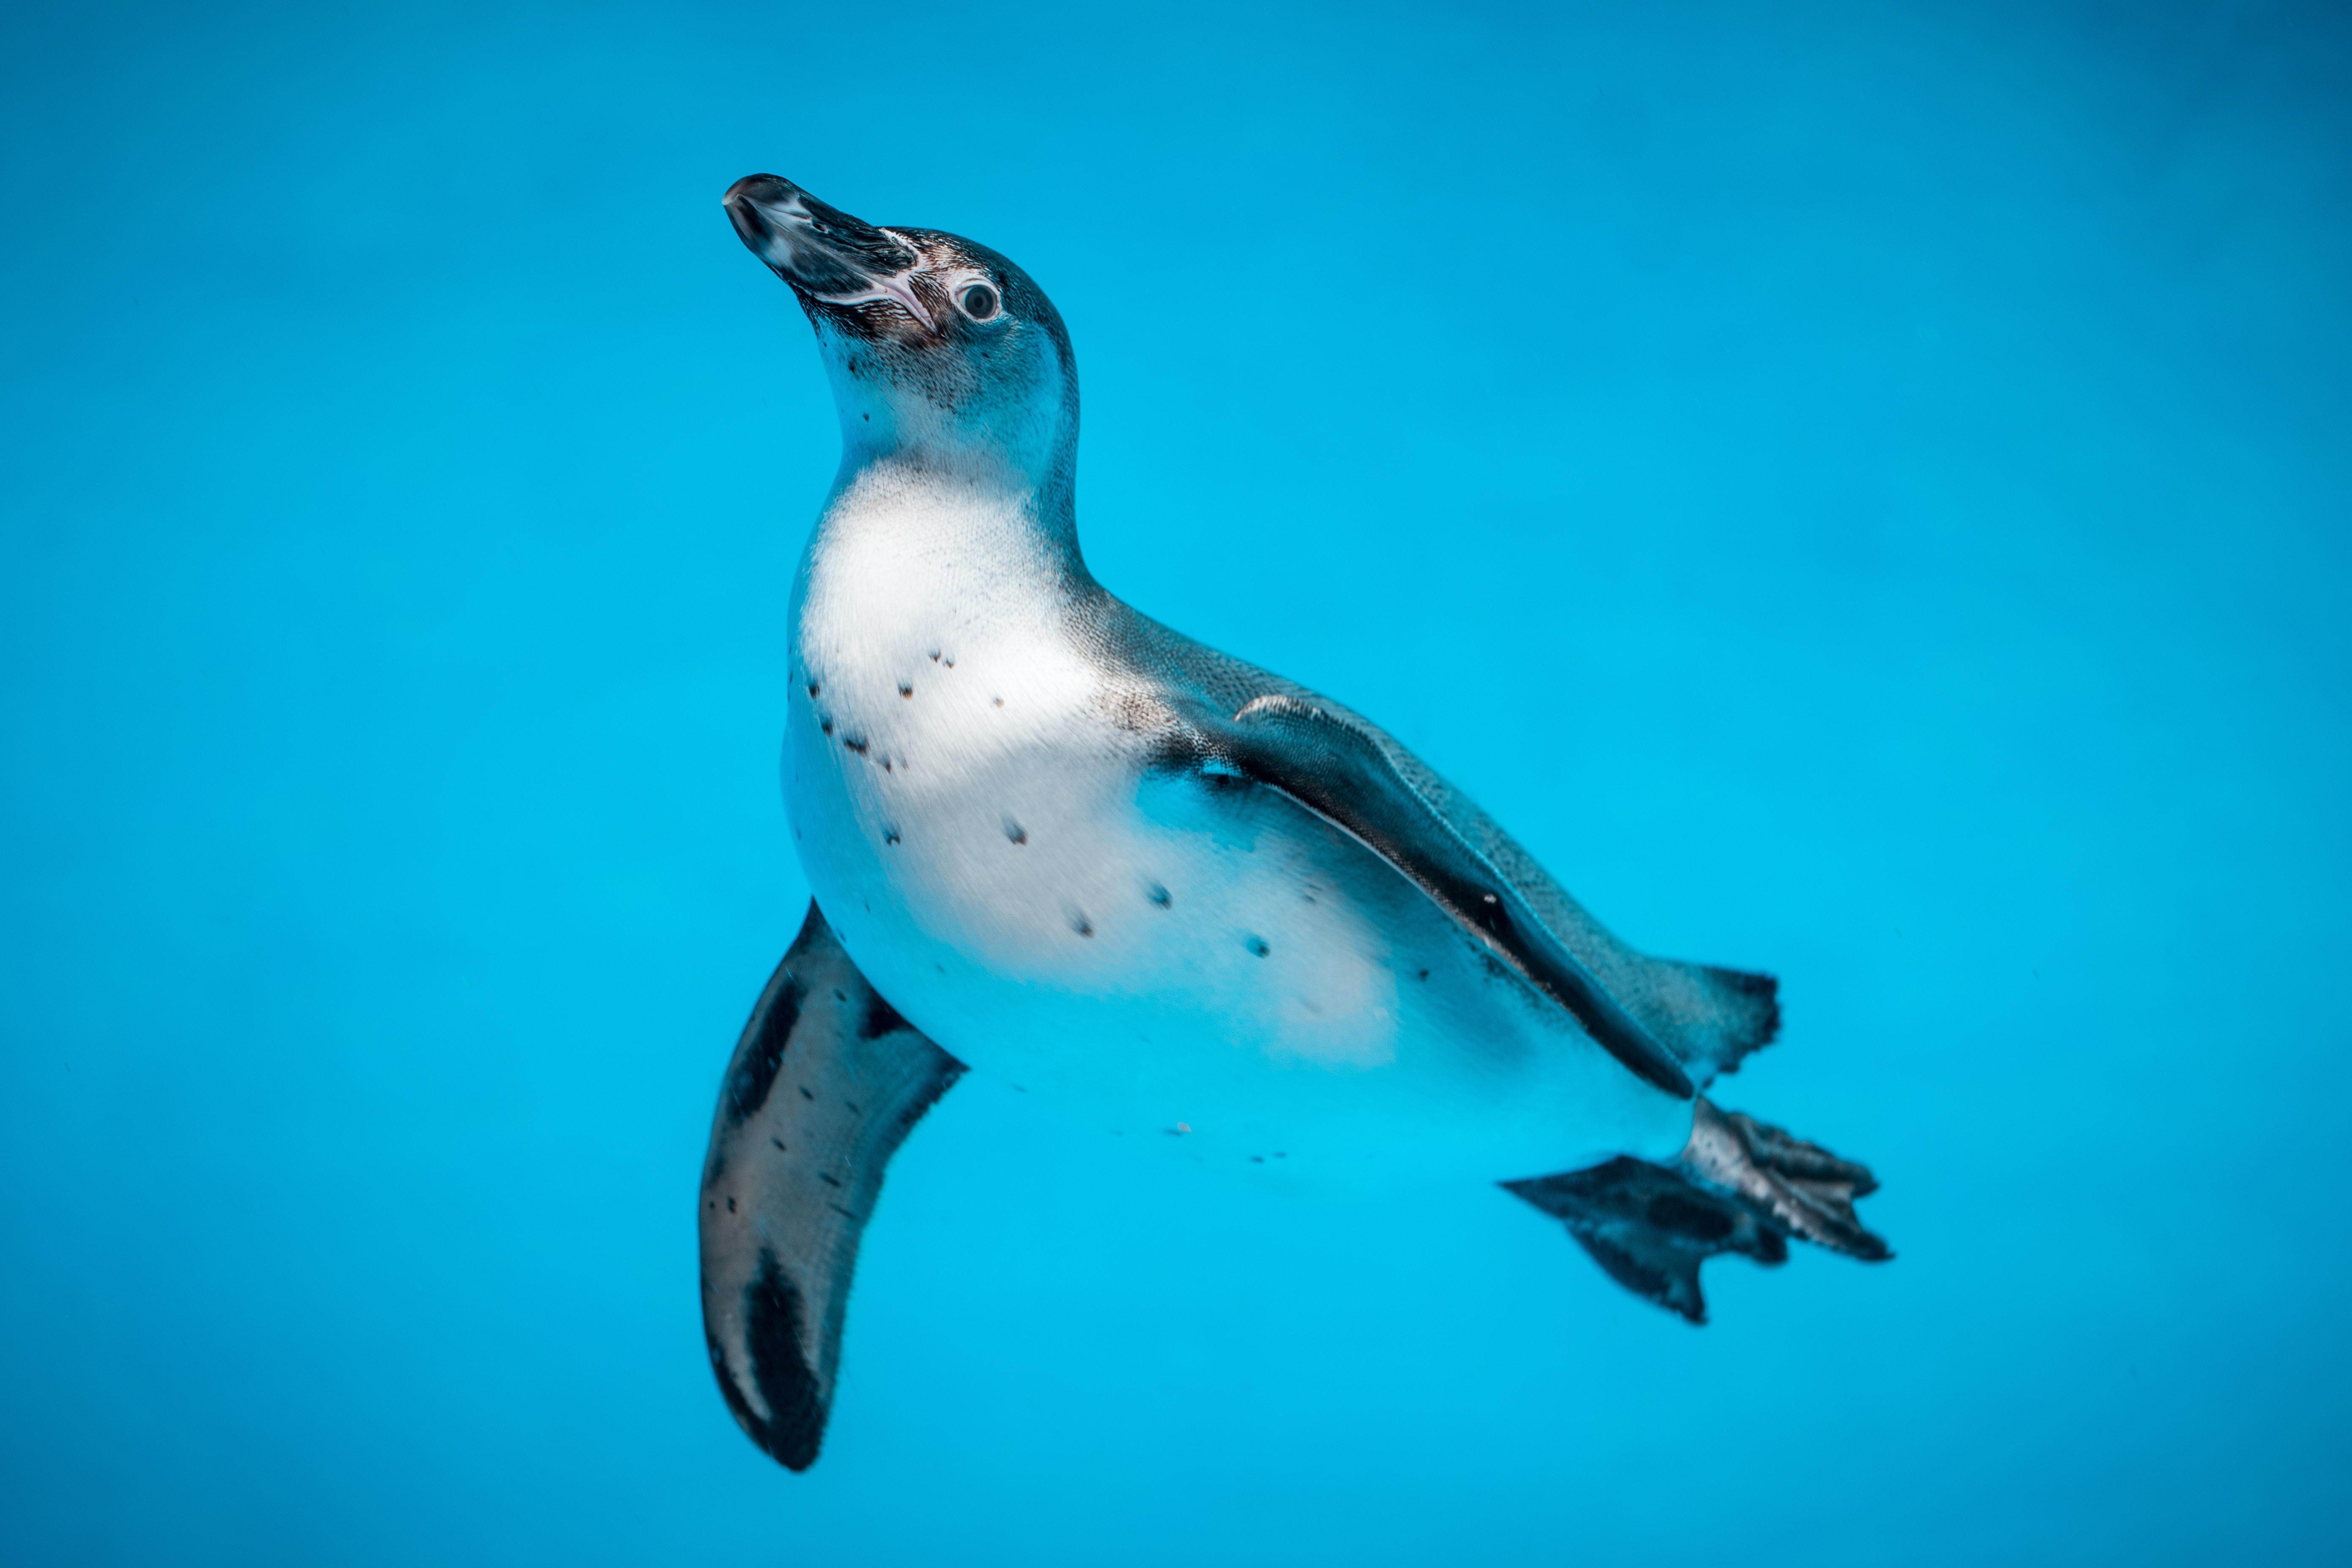 62805 download wallpaper Animals, Penguin, Bird, To Swim, Swim, Water, Underwater World screensavers and pictures for free